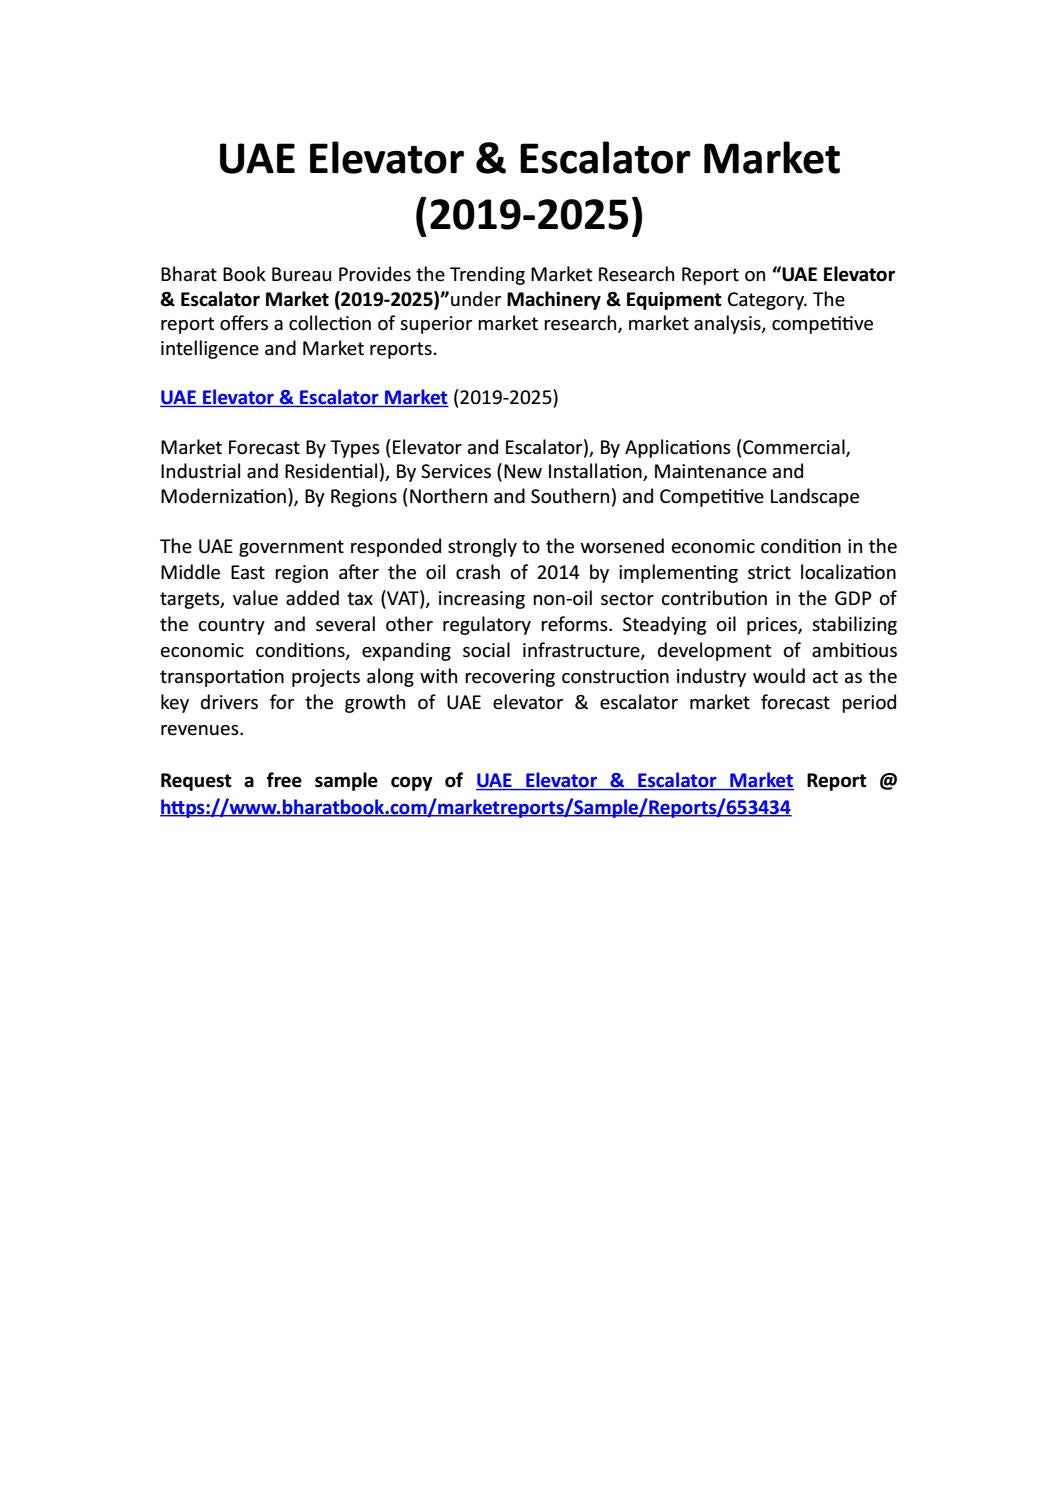 UAE Elevator & Escalator Market (2019-2025) by Bharat Book